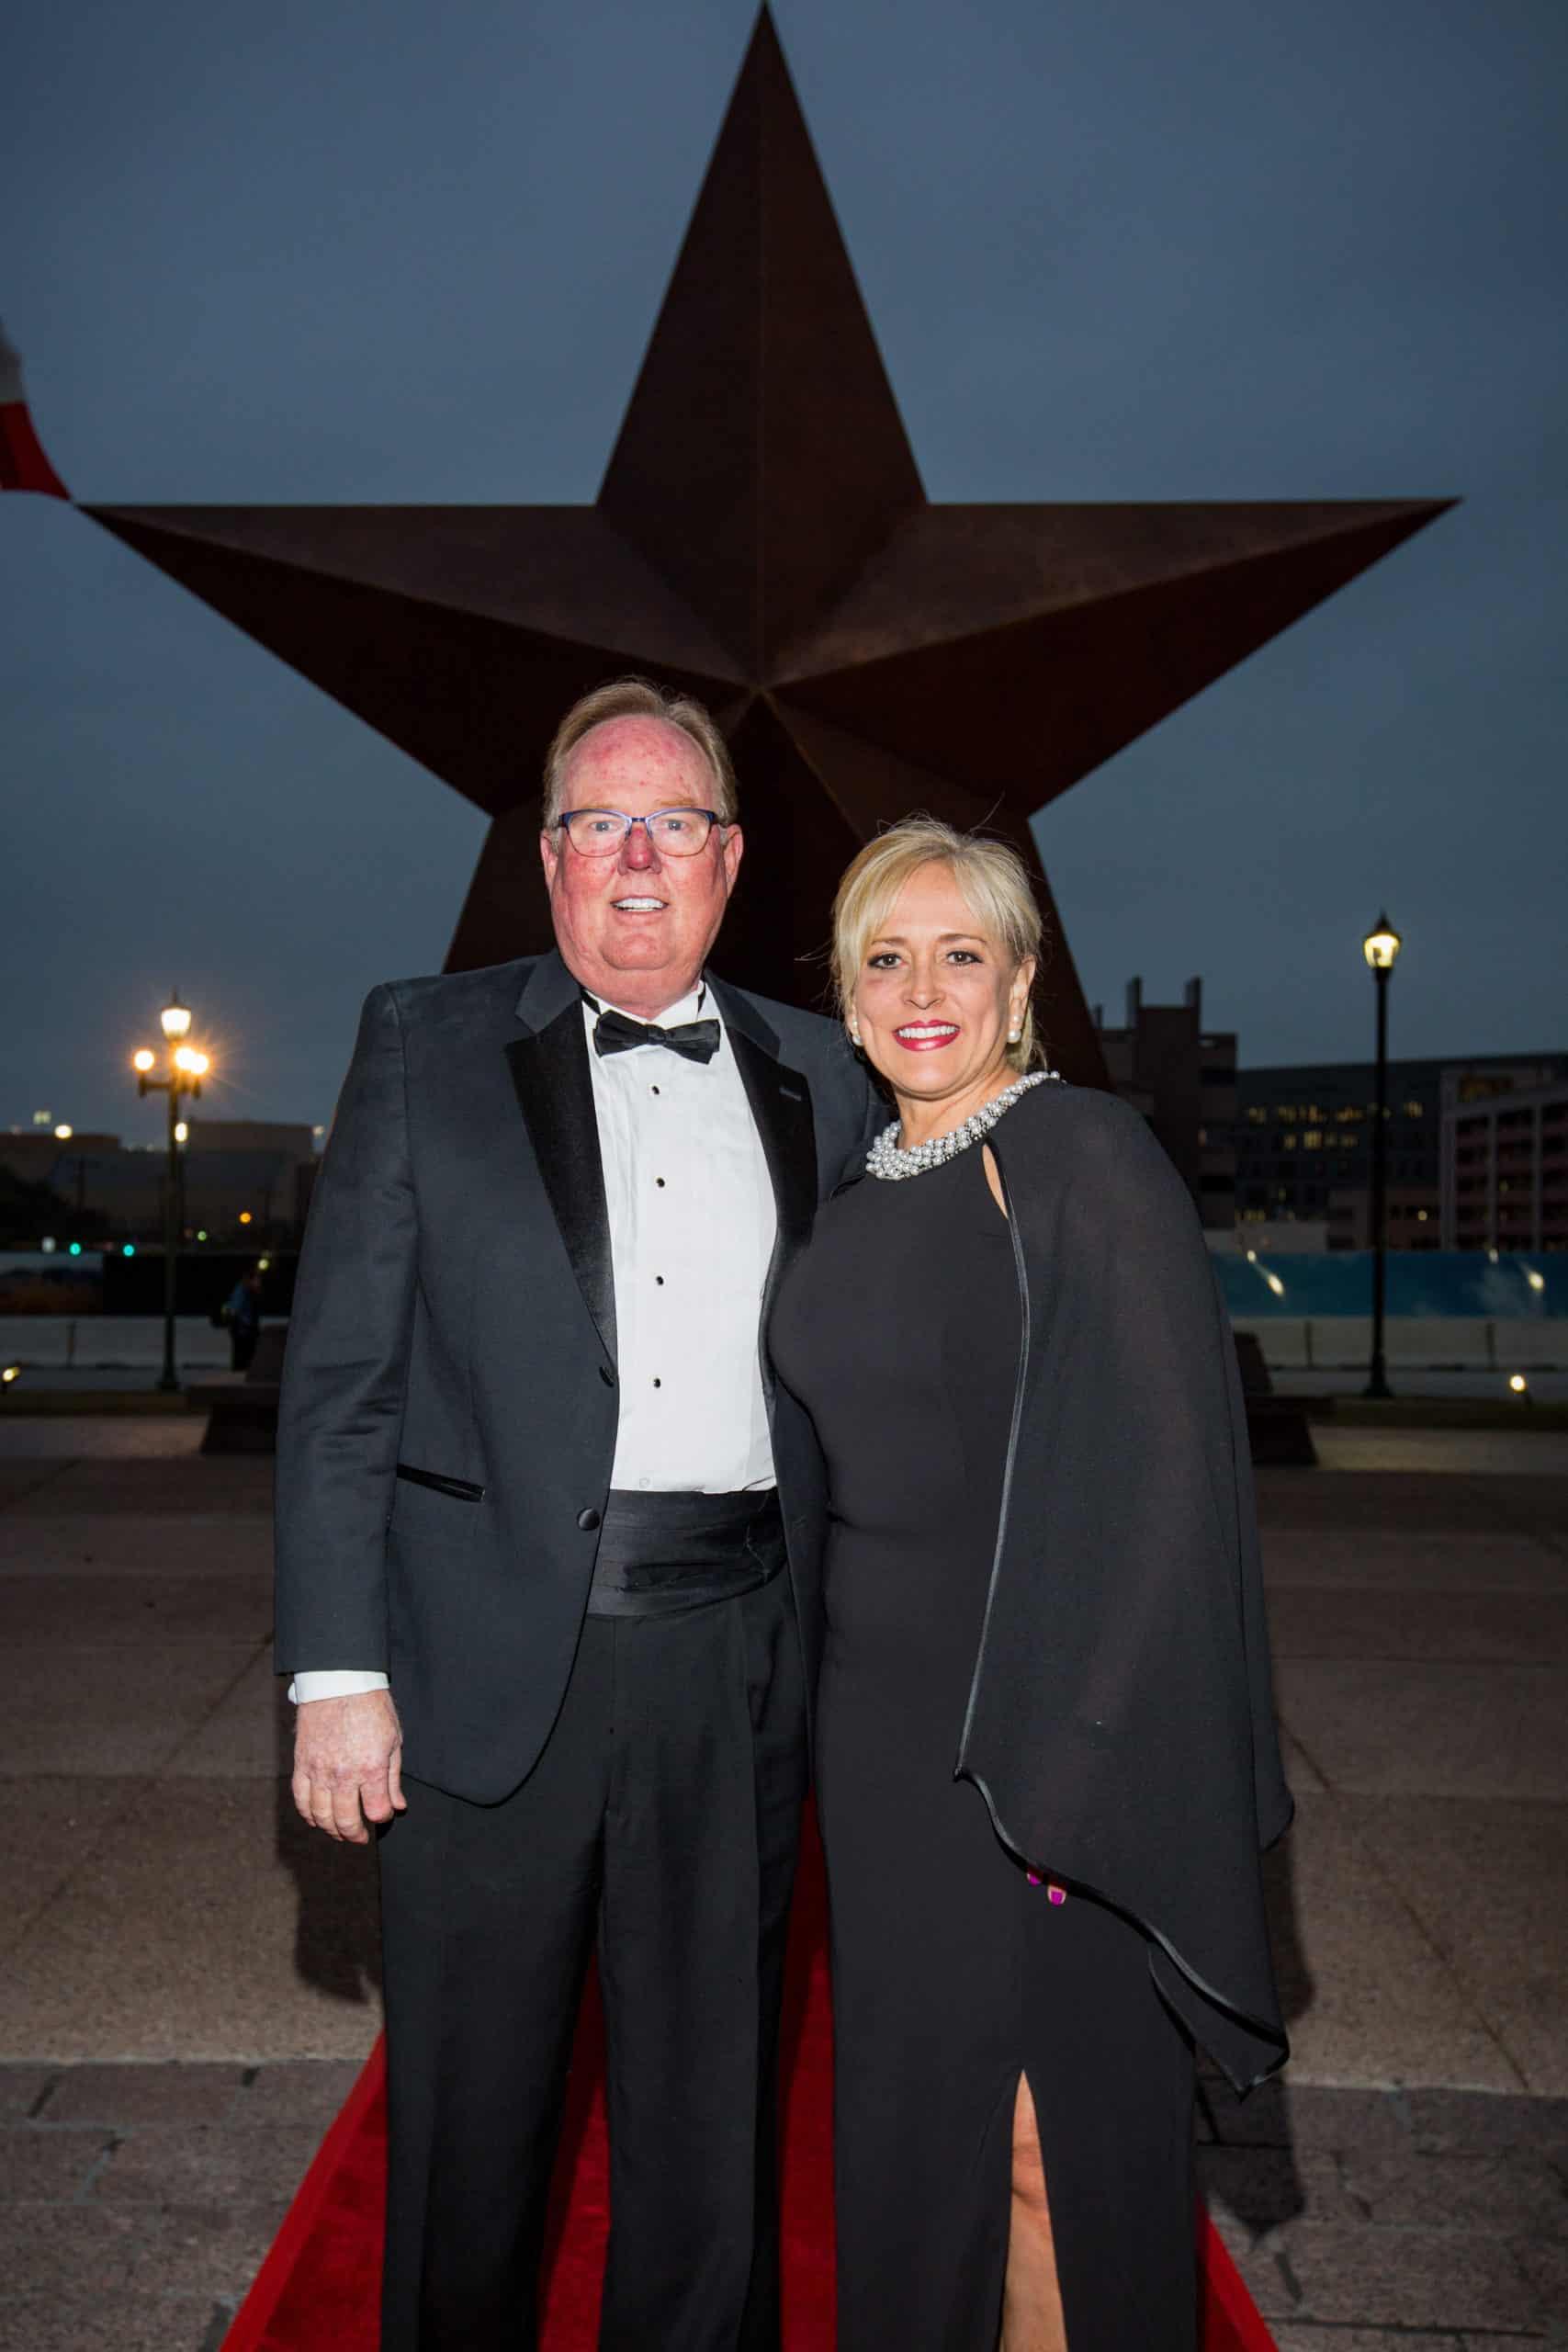 Jeff and Sylvia Thomas